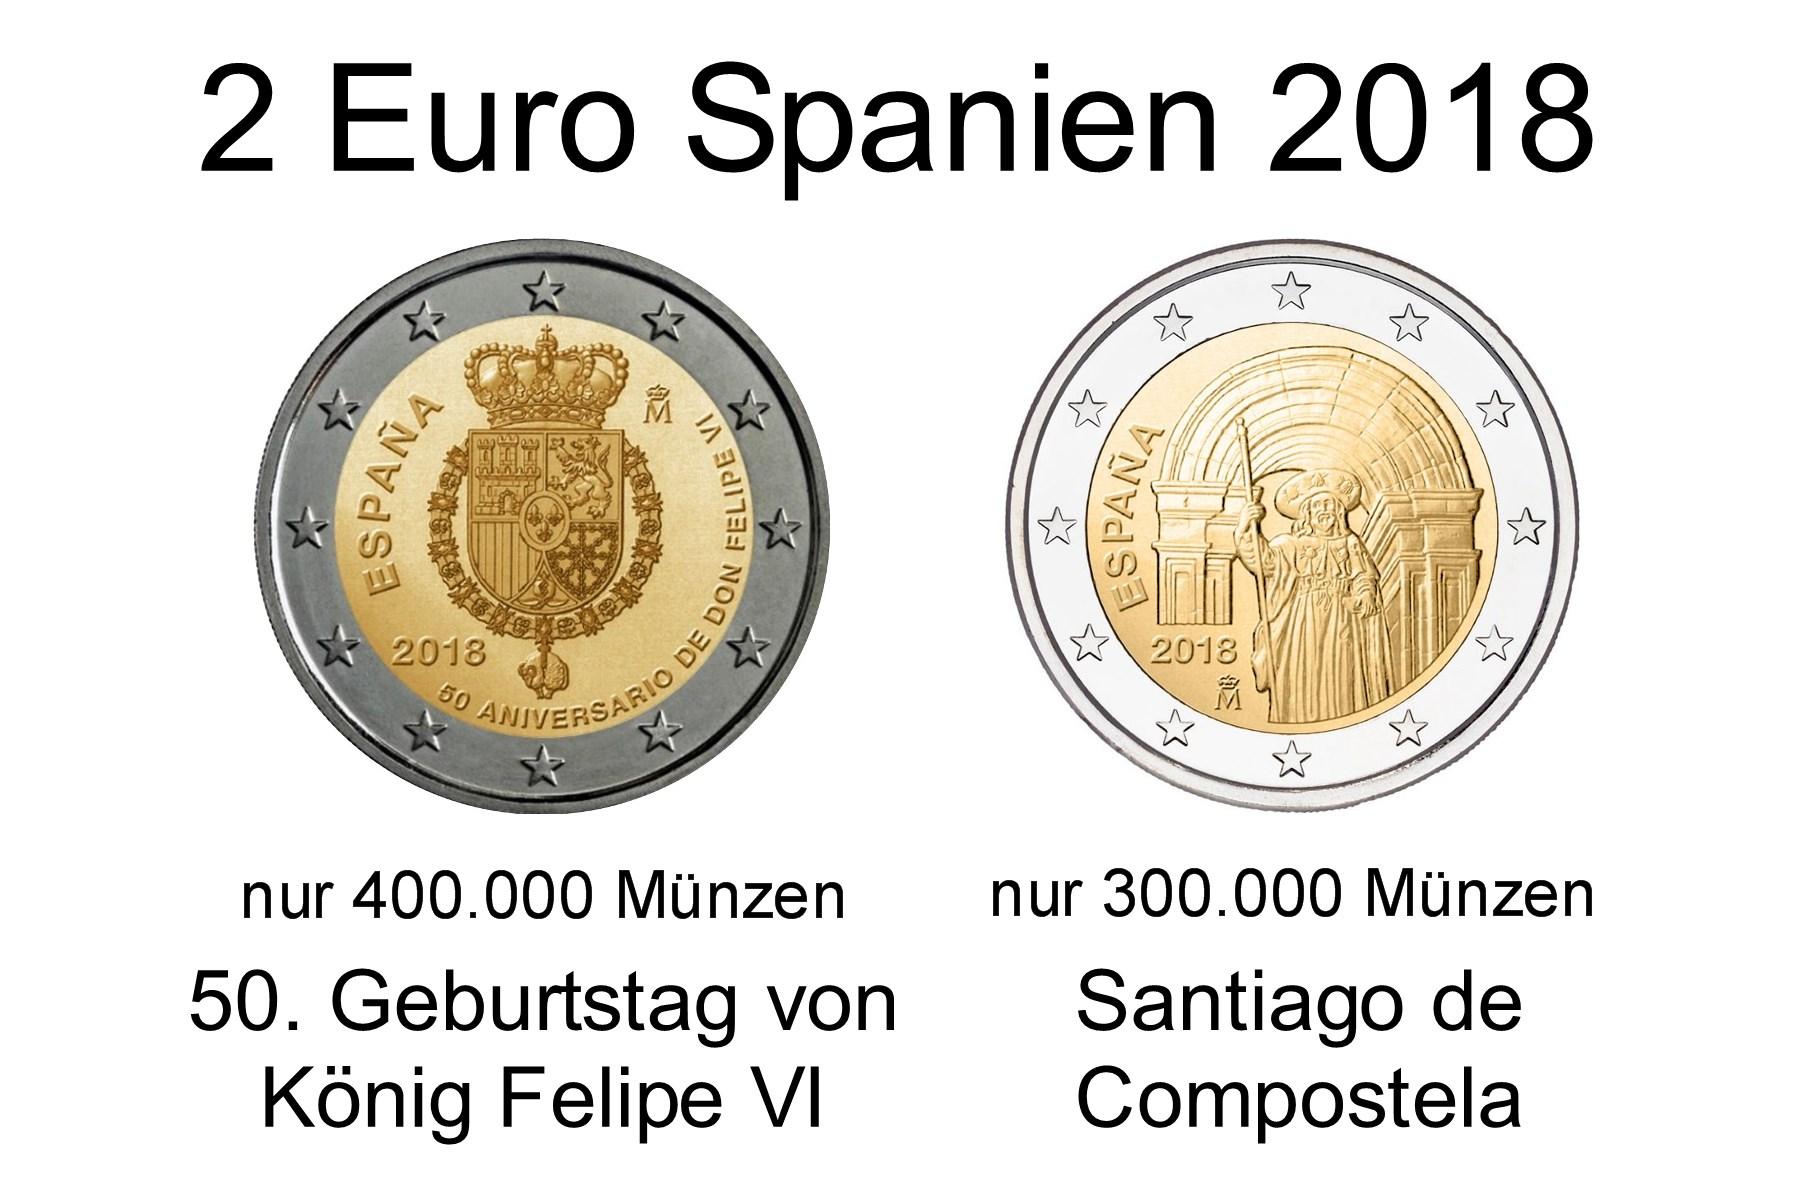 2x 2 Euro Spanien 2018 König Felipe Visantiago De Compostela